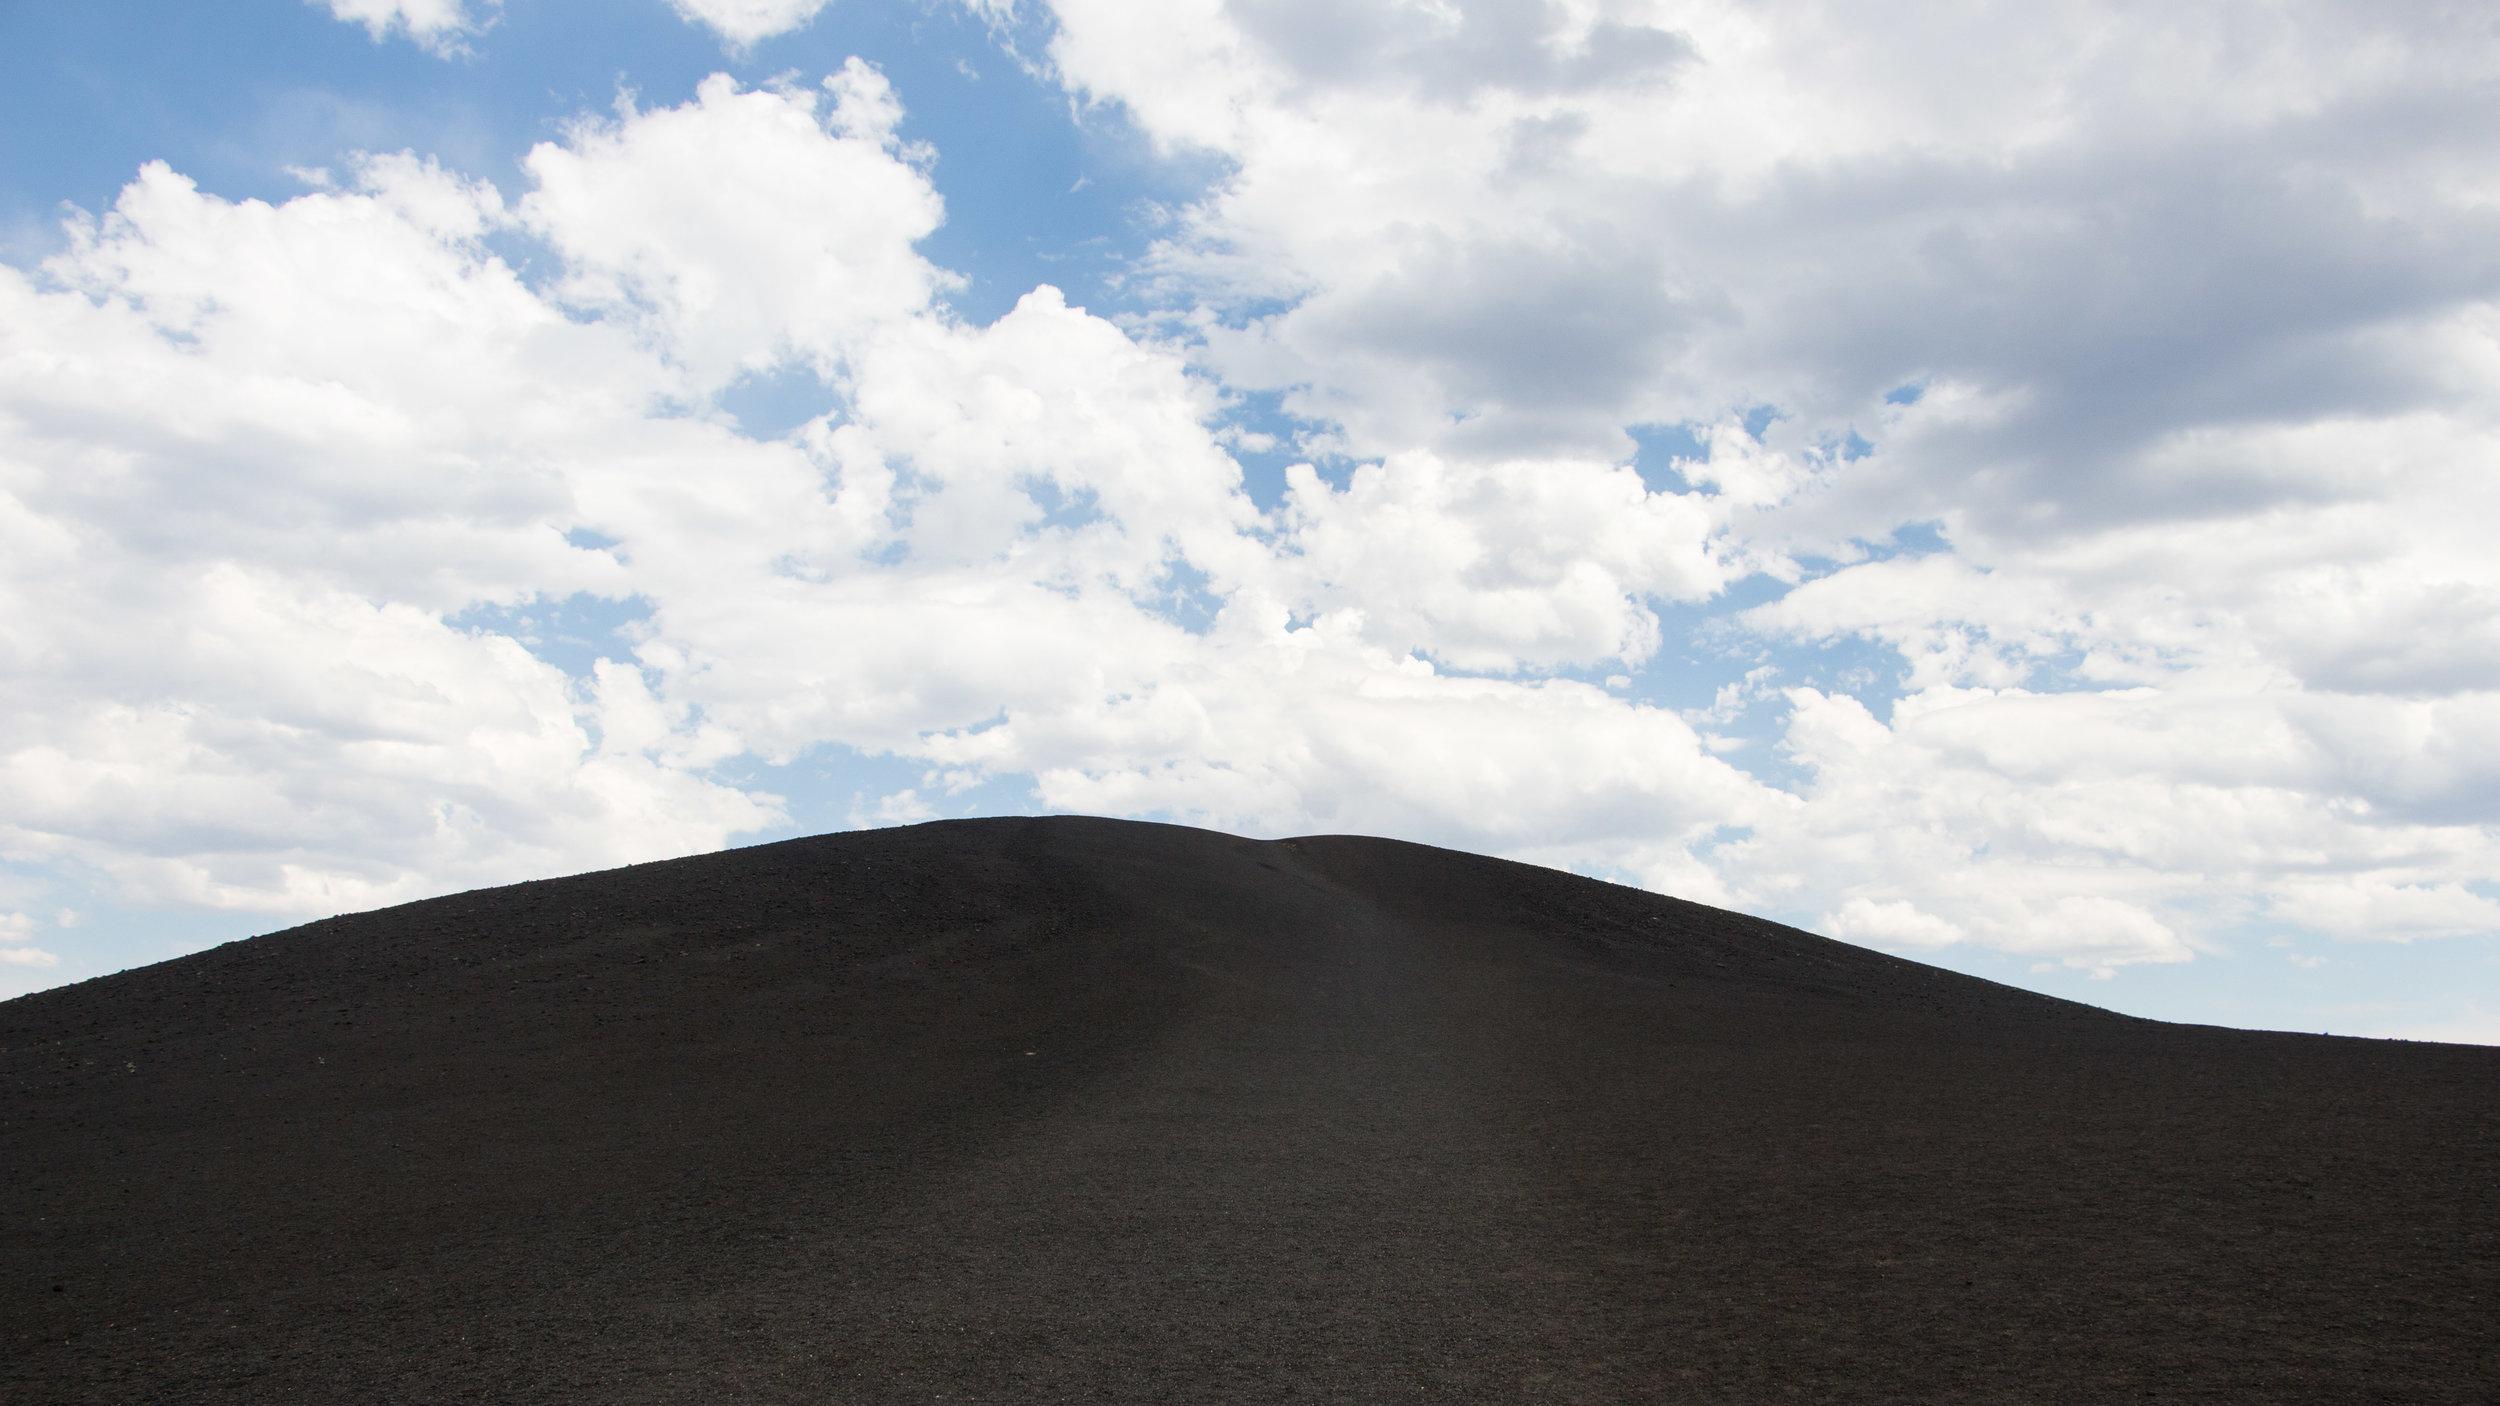 CratersoftheMoon-1.jpg